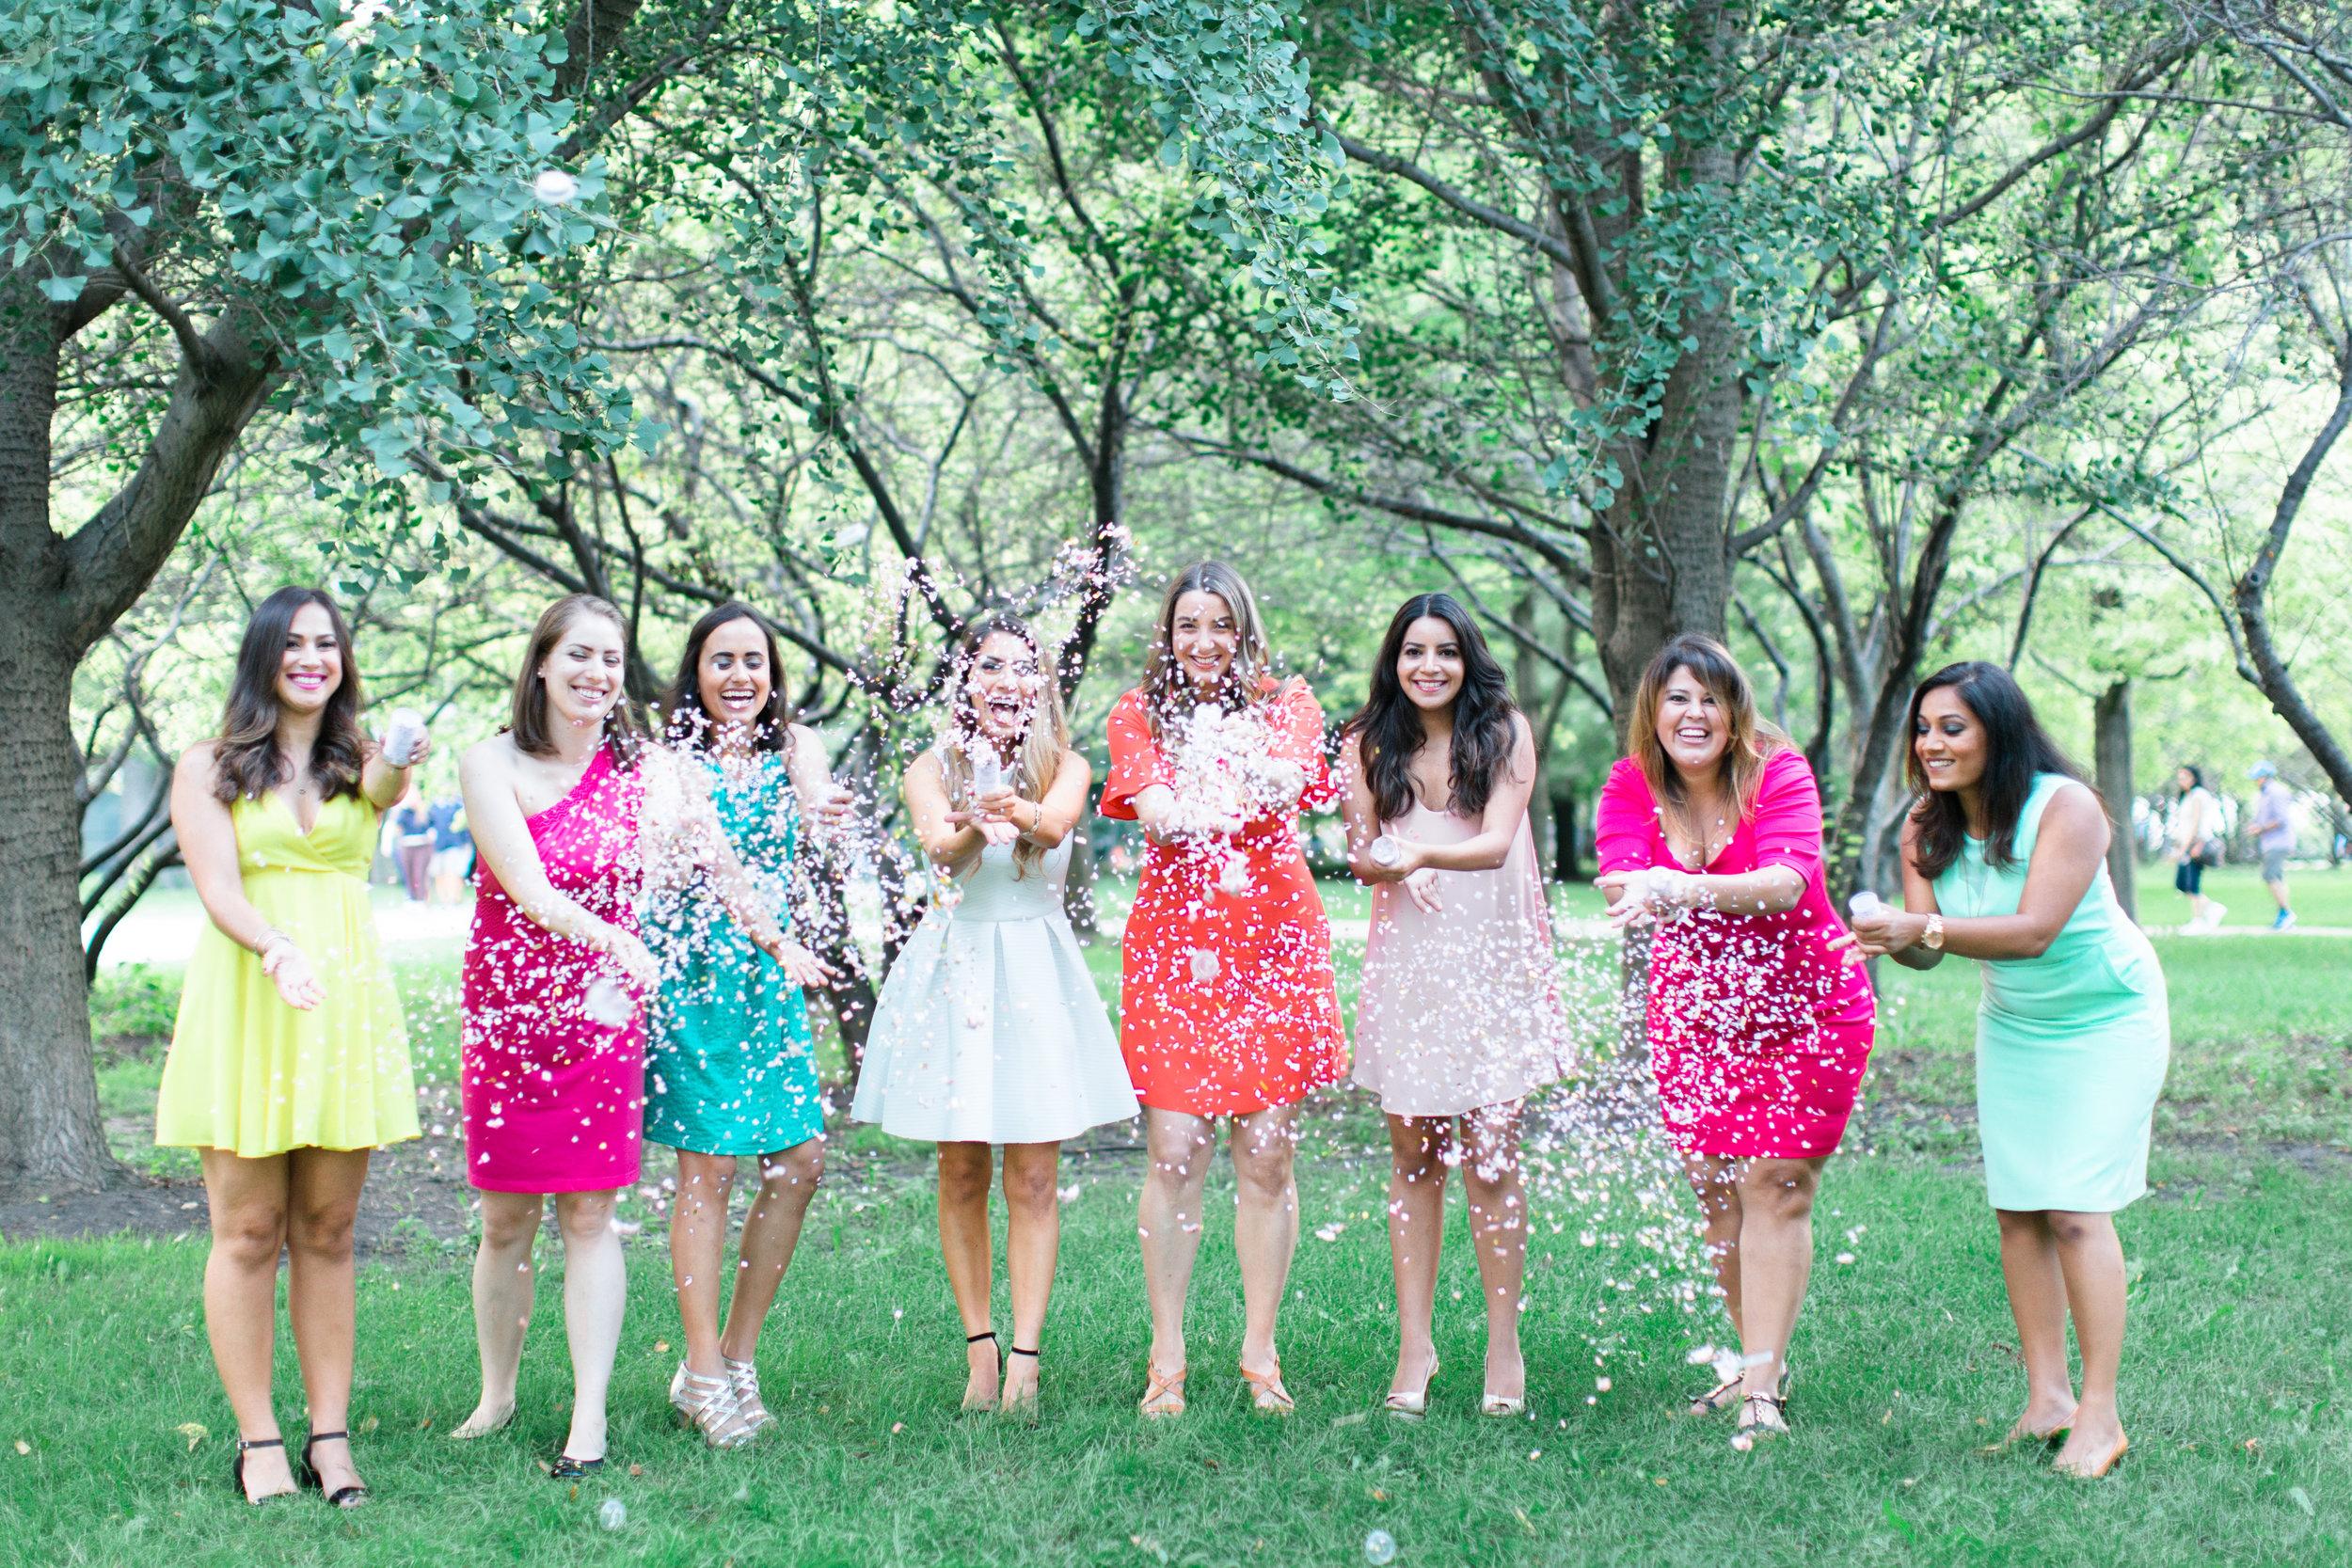 Bonphotage Chicago Bridal Shower Photography